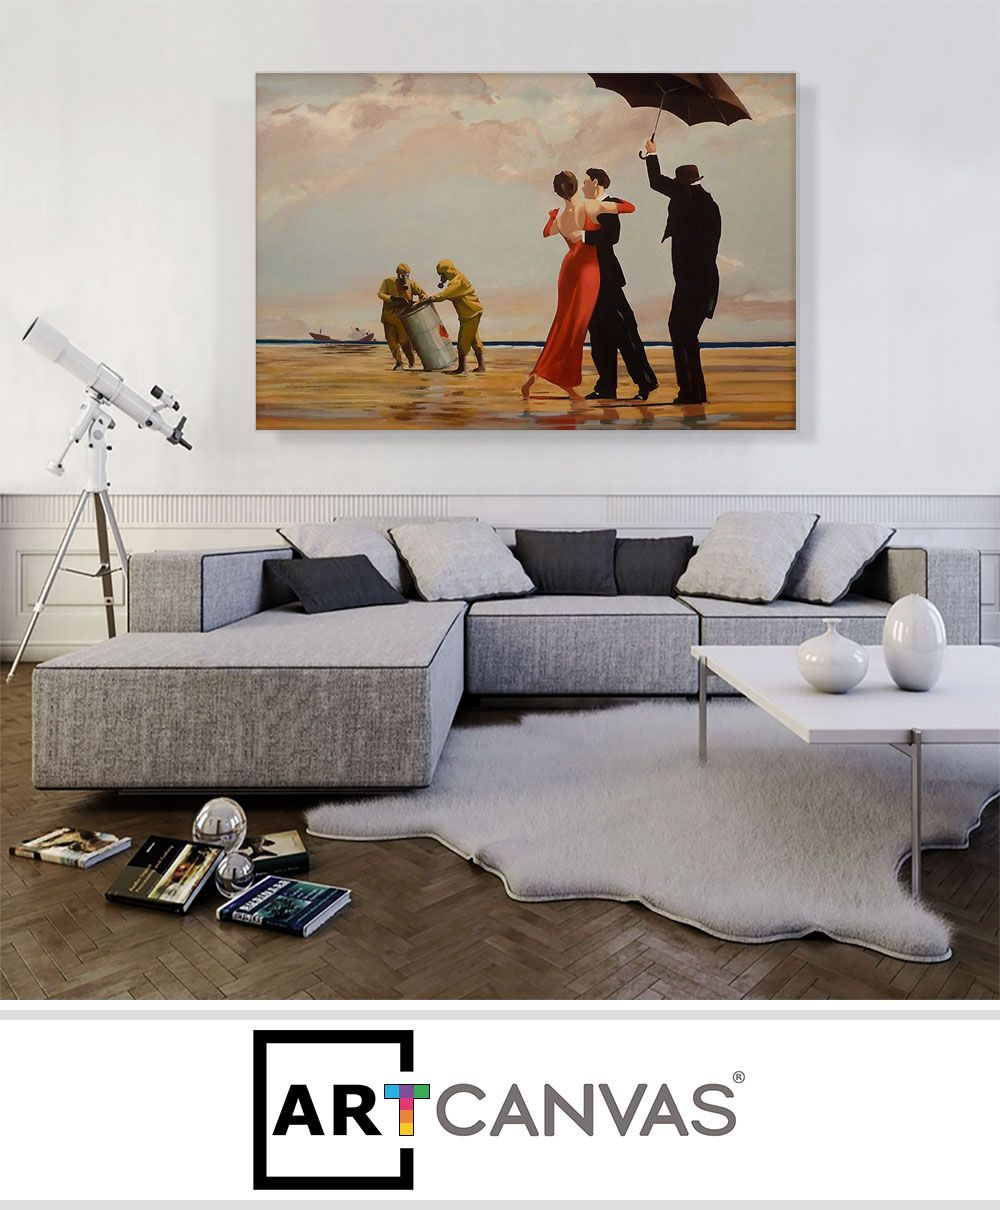 Dancing Butler on Toxic Beach Crude Oil | Banksy Canvas ART Prints